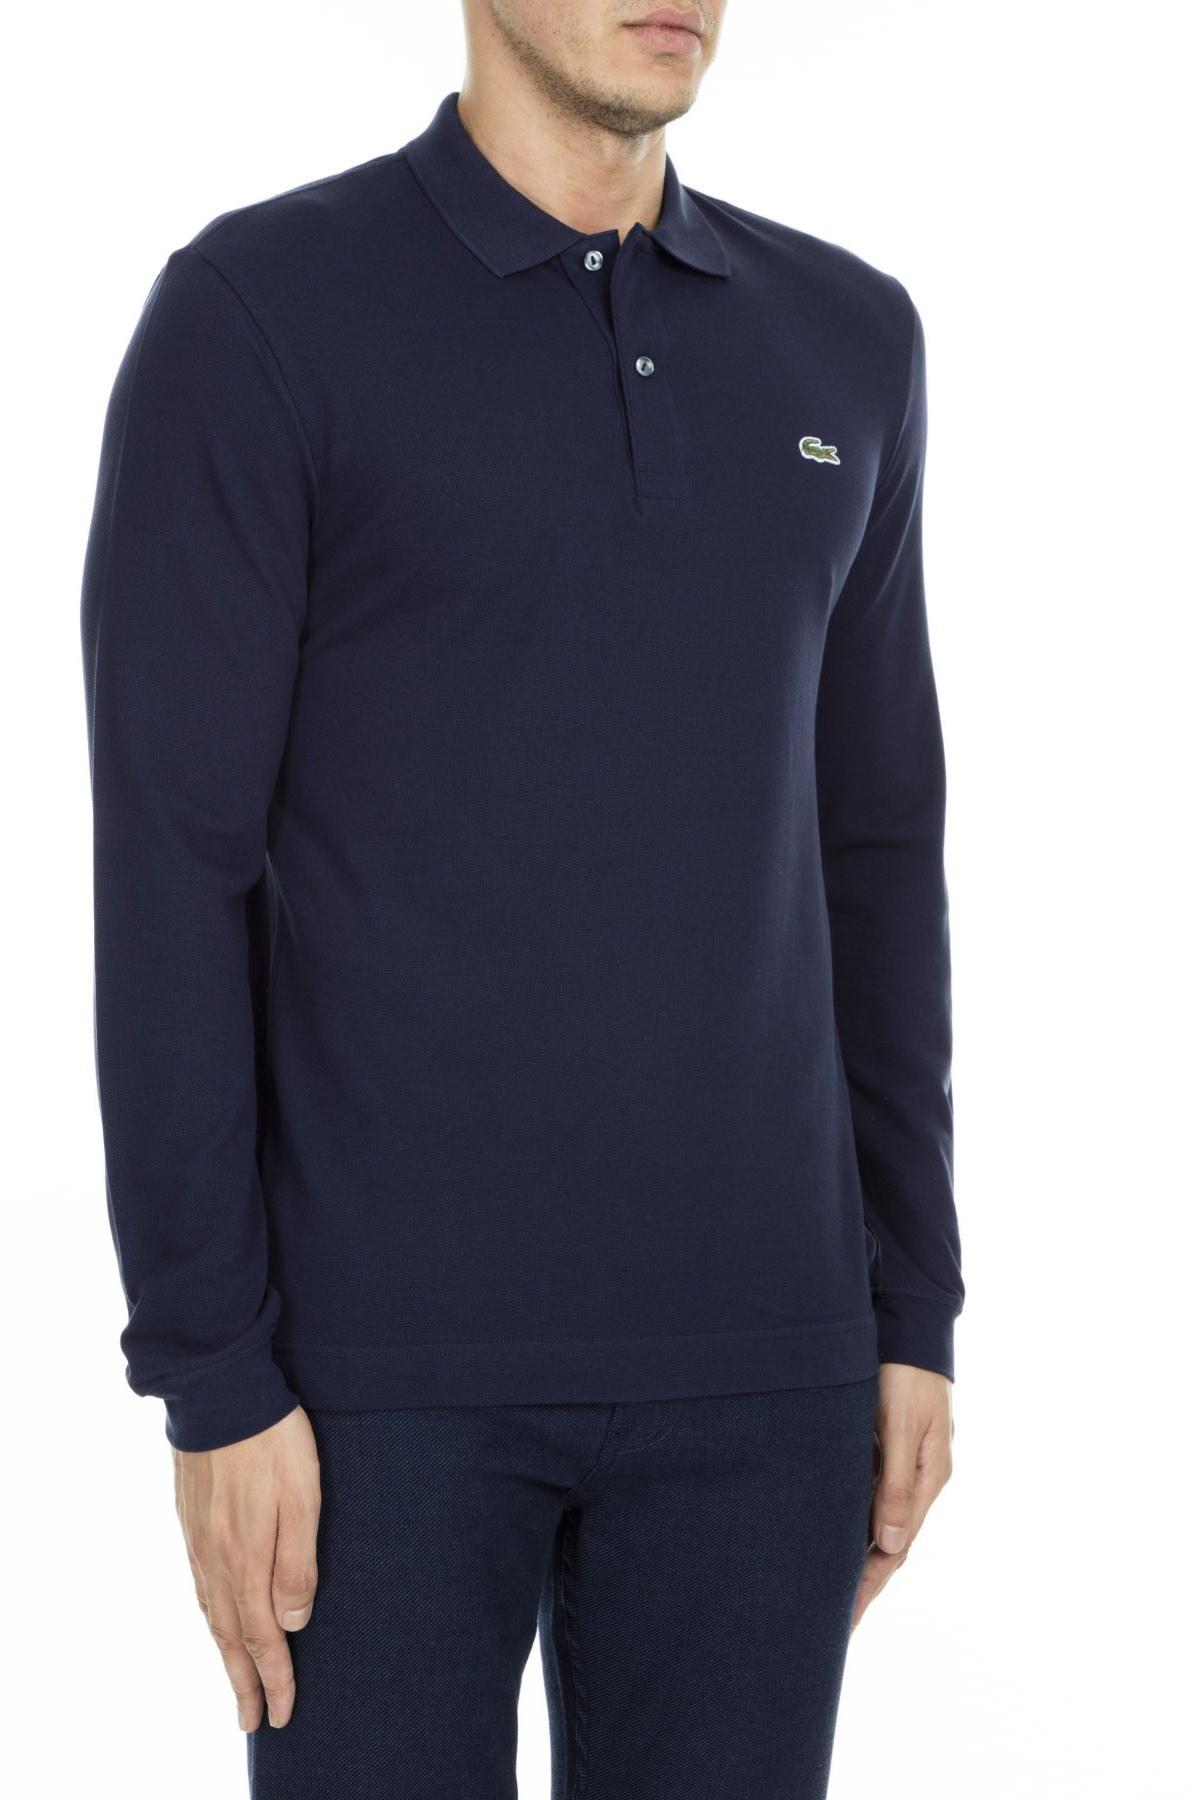 Lacoste T Shirt Erkek Polo PH4013 166 LACİVERT